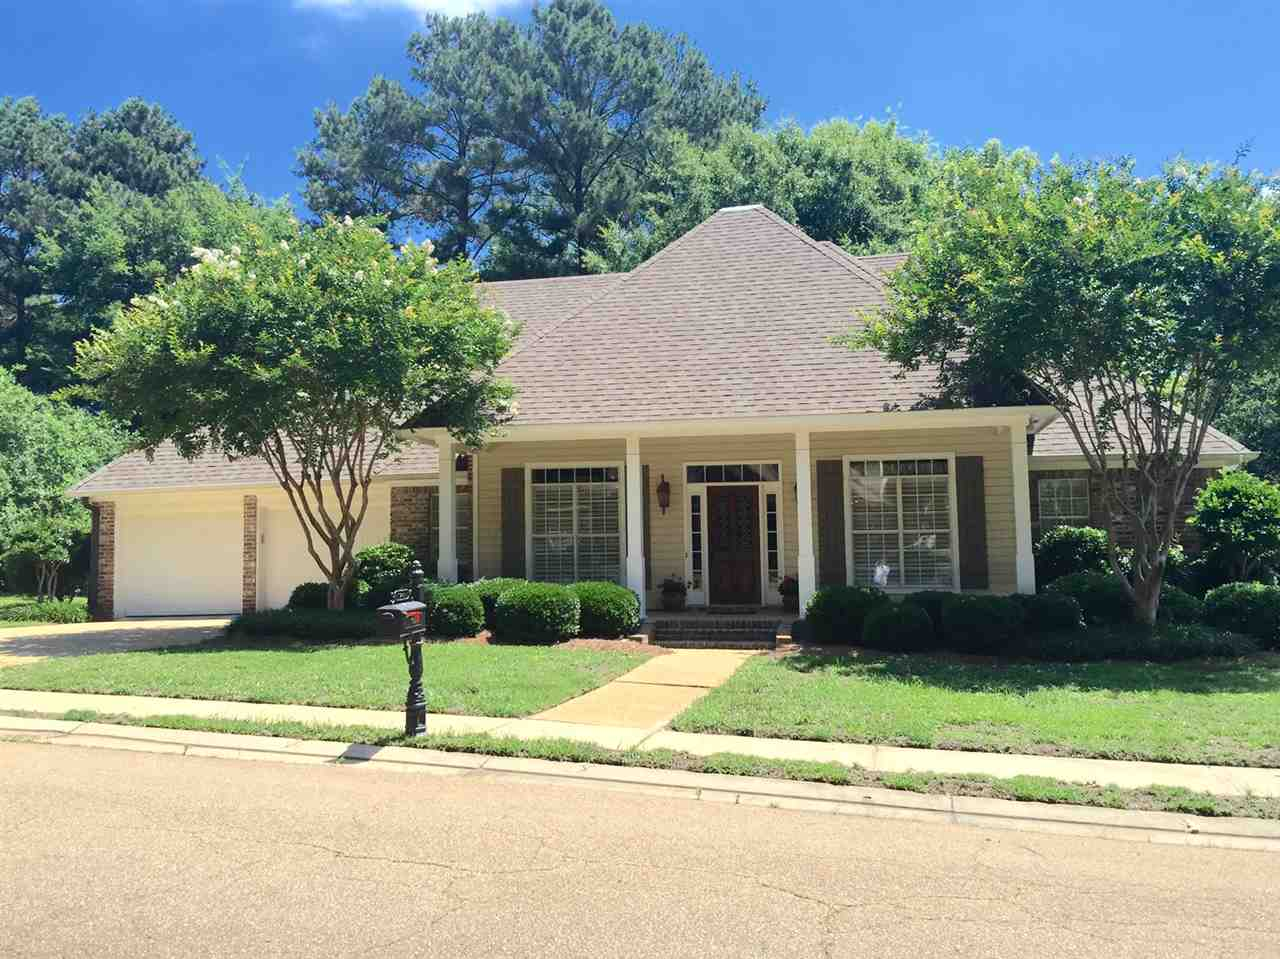 Real Estate for Sale, ListingId: 33740597, Madison,MS39110